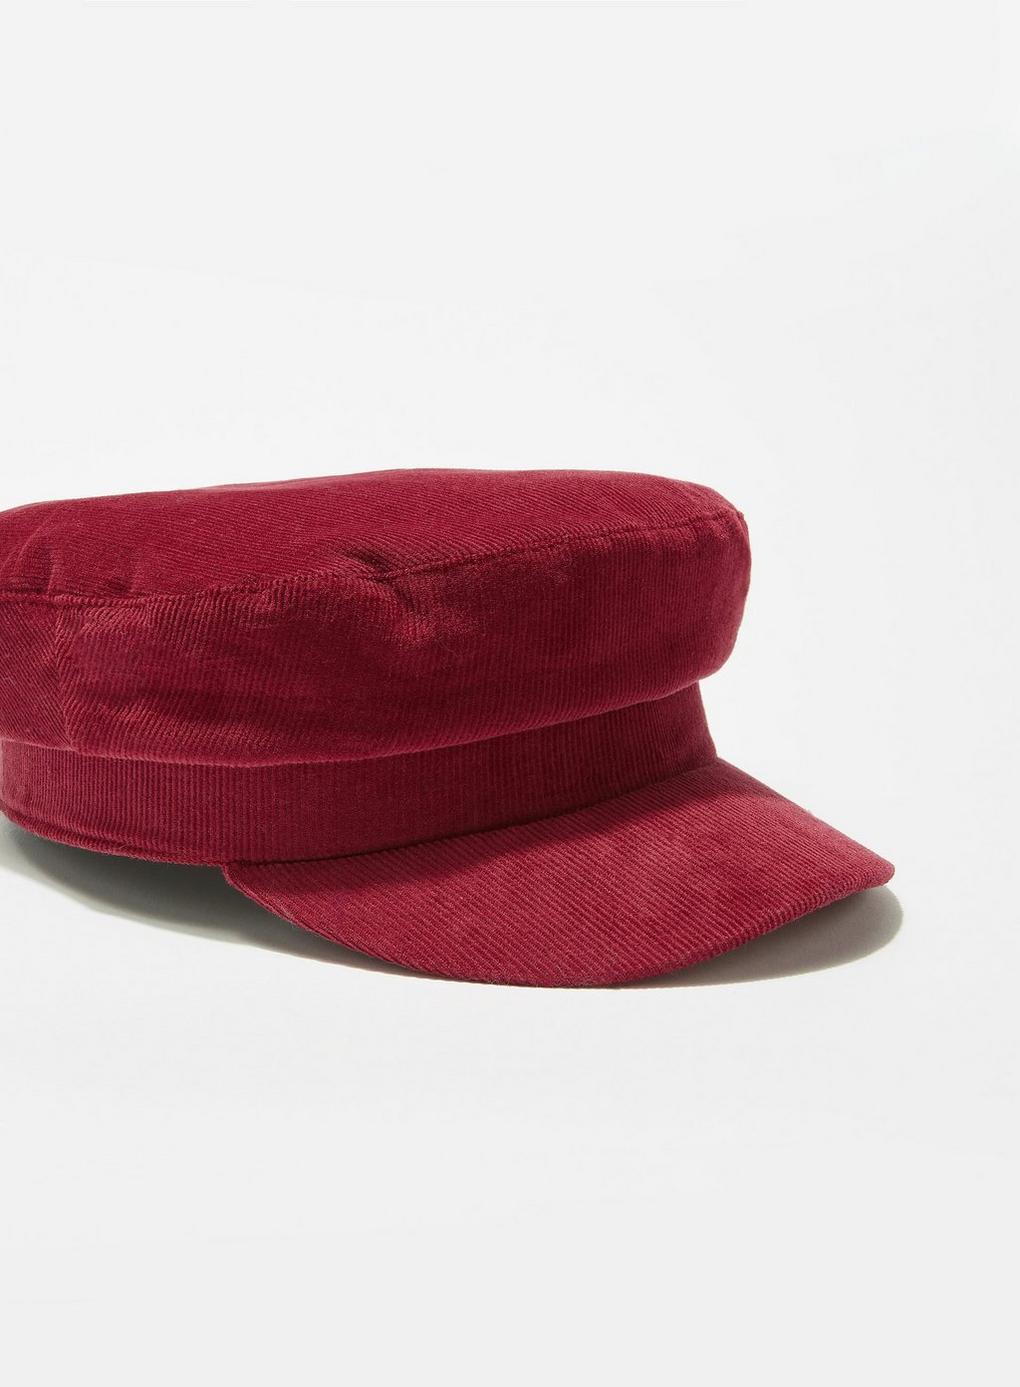 633e8b30574 Miss Selfridge - Red Burgundy Corduroy Baker Boy Hat - Lyst. View fullscreen